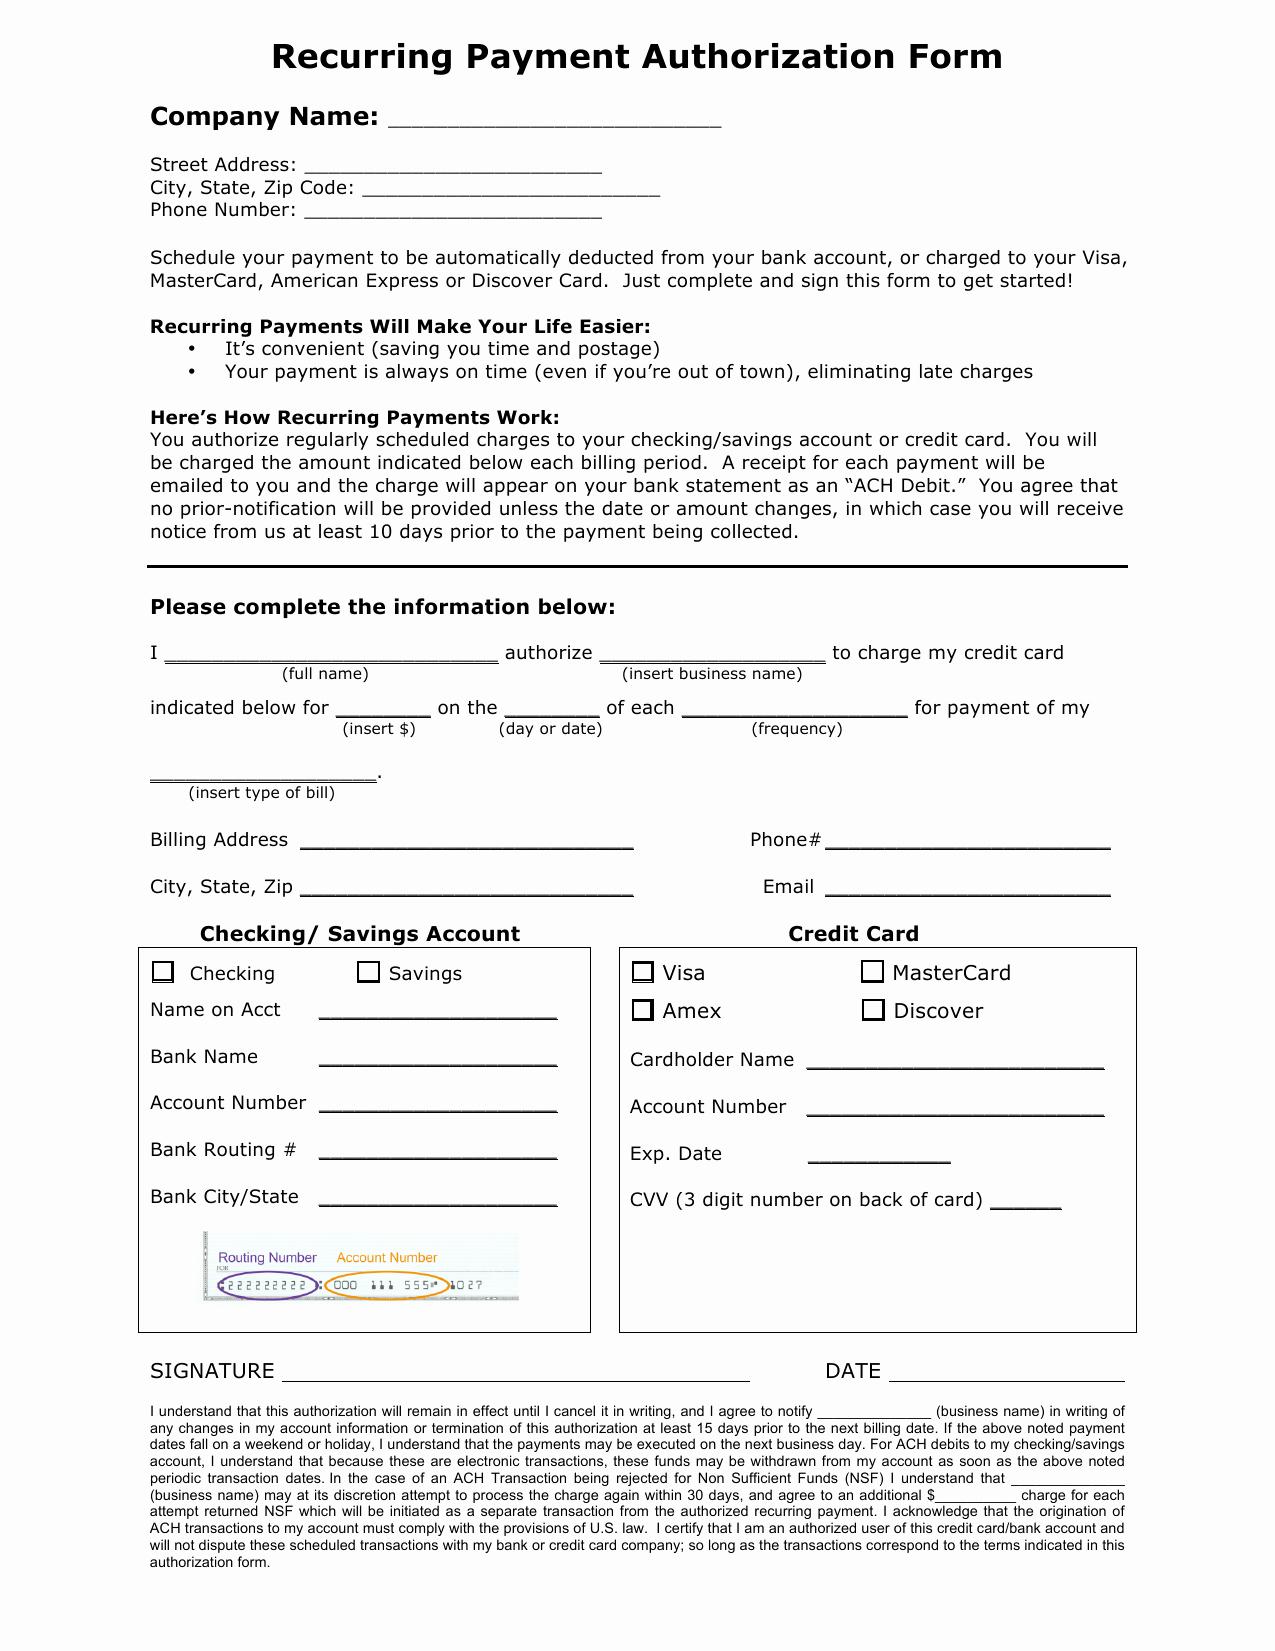 Ach Deposit Authorization form Template Best Of Download Recurring Payment Authorization form Template